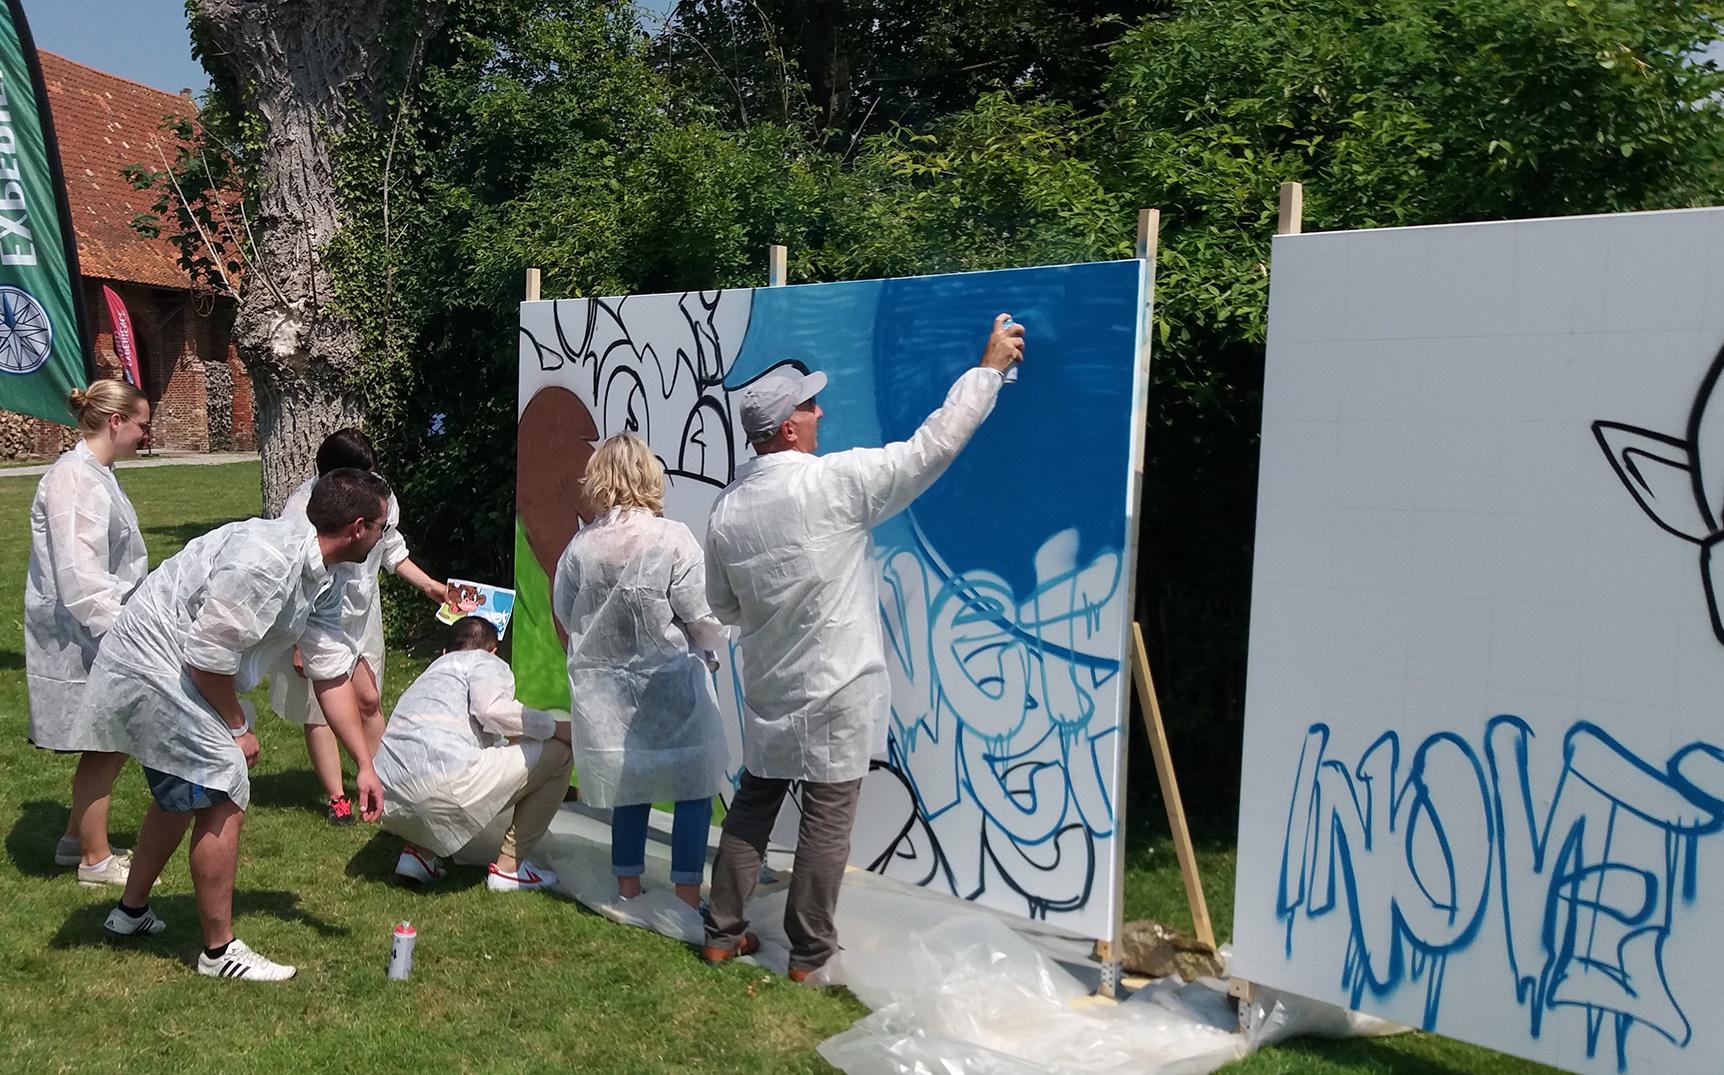 activité graffiti